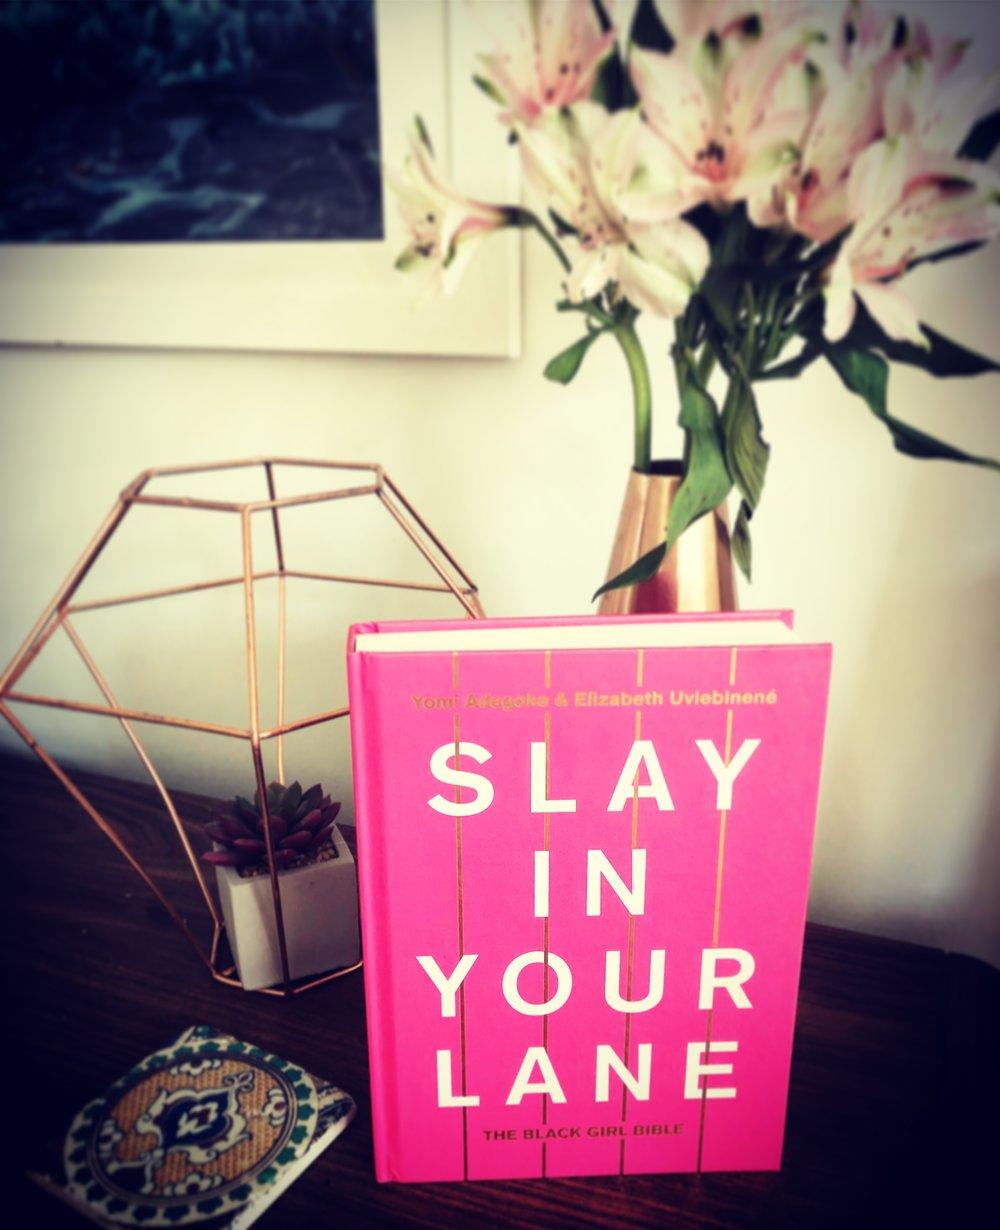 SLAY IN YOUR LANE: YOMI ADEGOKE + ELIZABETH UVIEBINENE